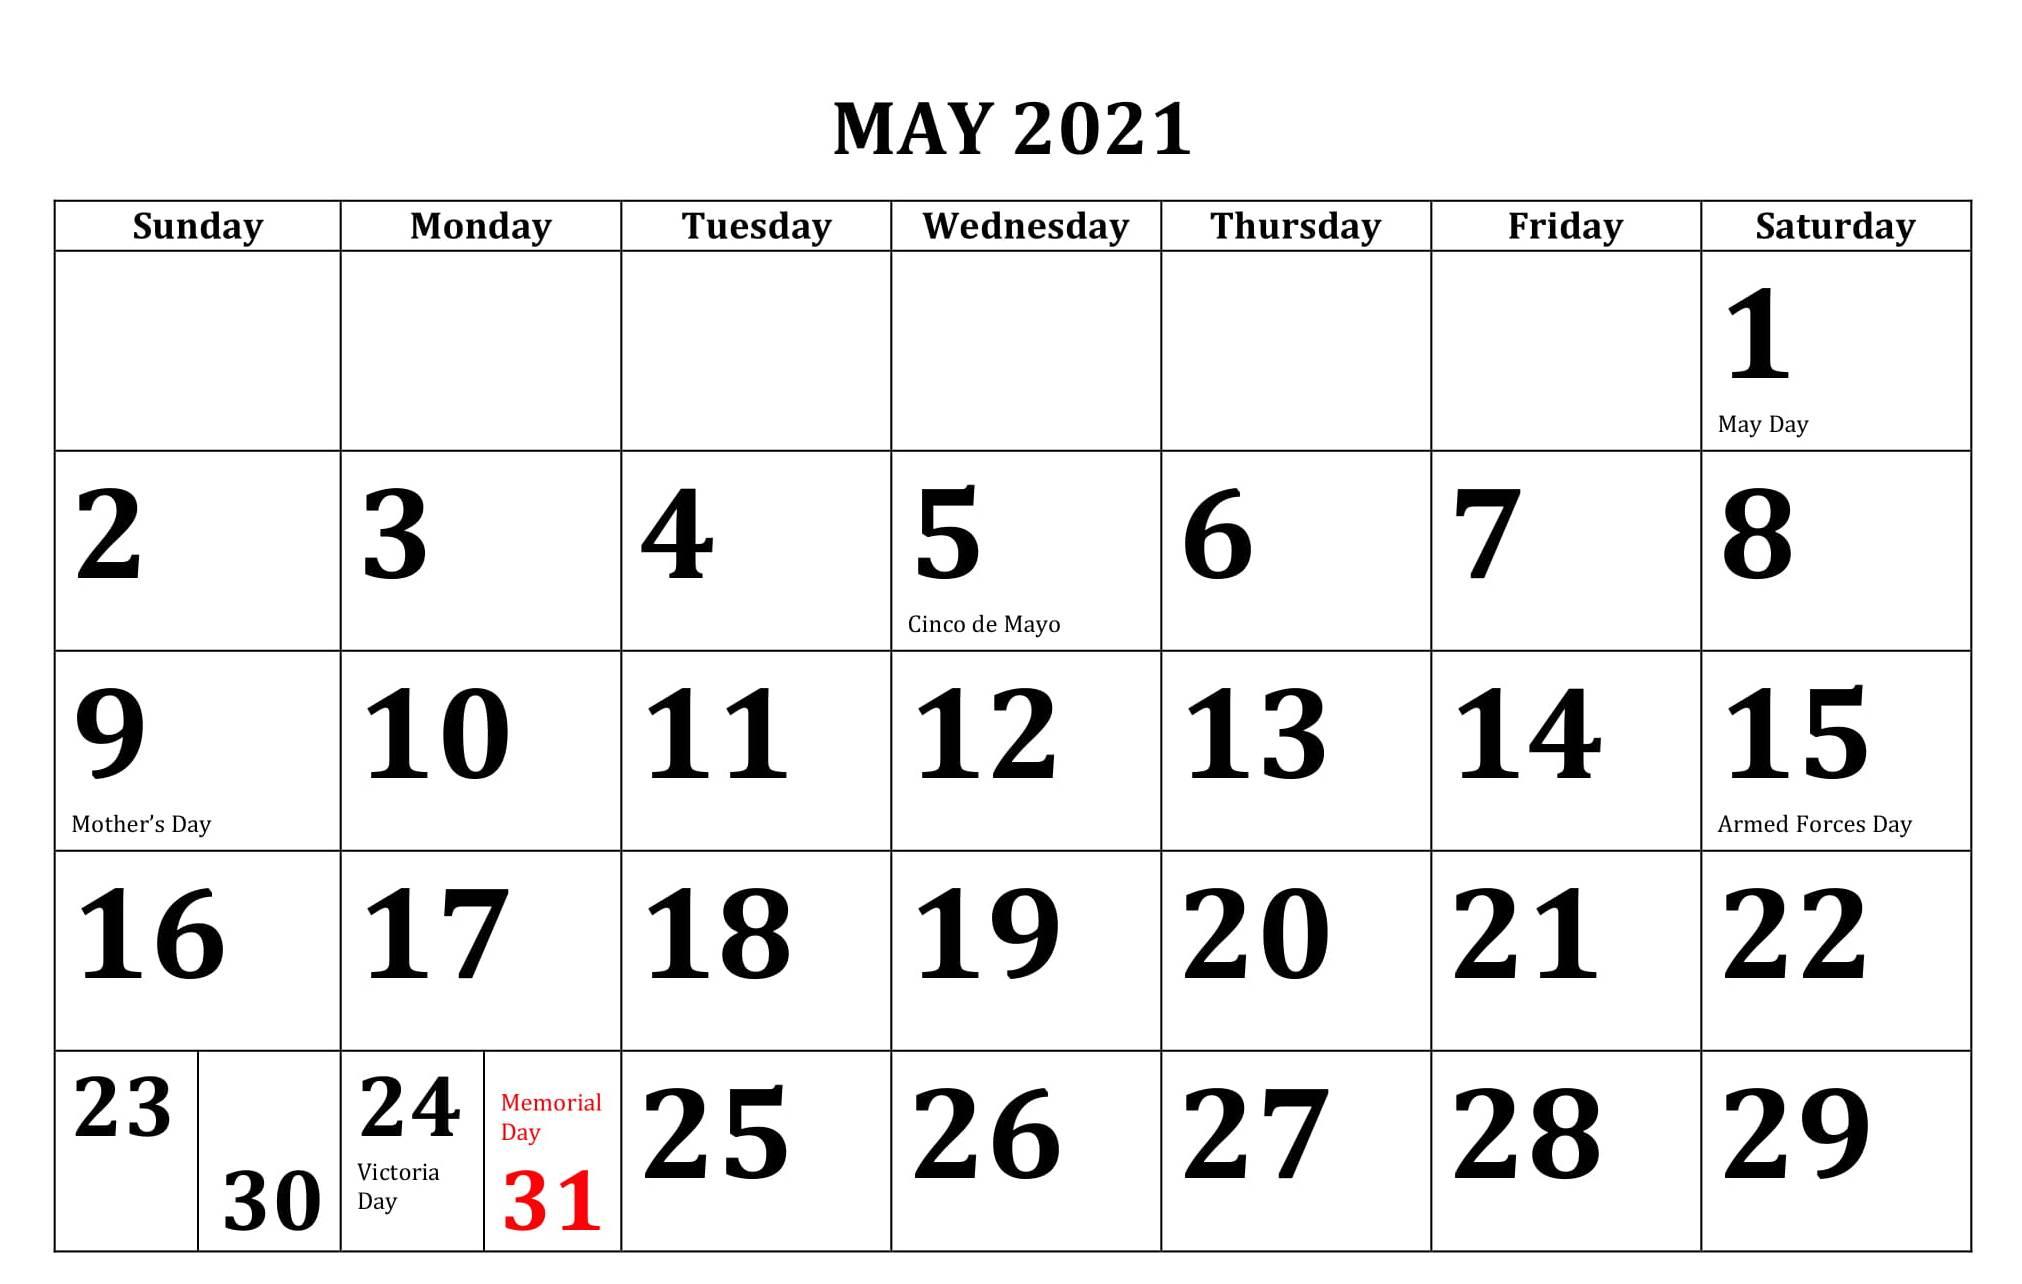 May 2021 Calendar USA Bank & Public Holidays Template